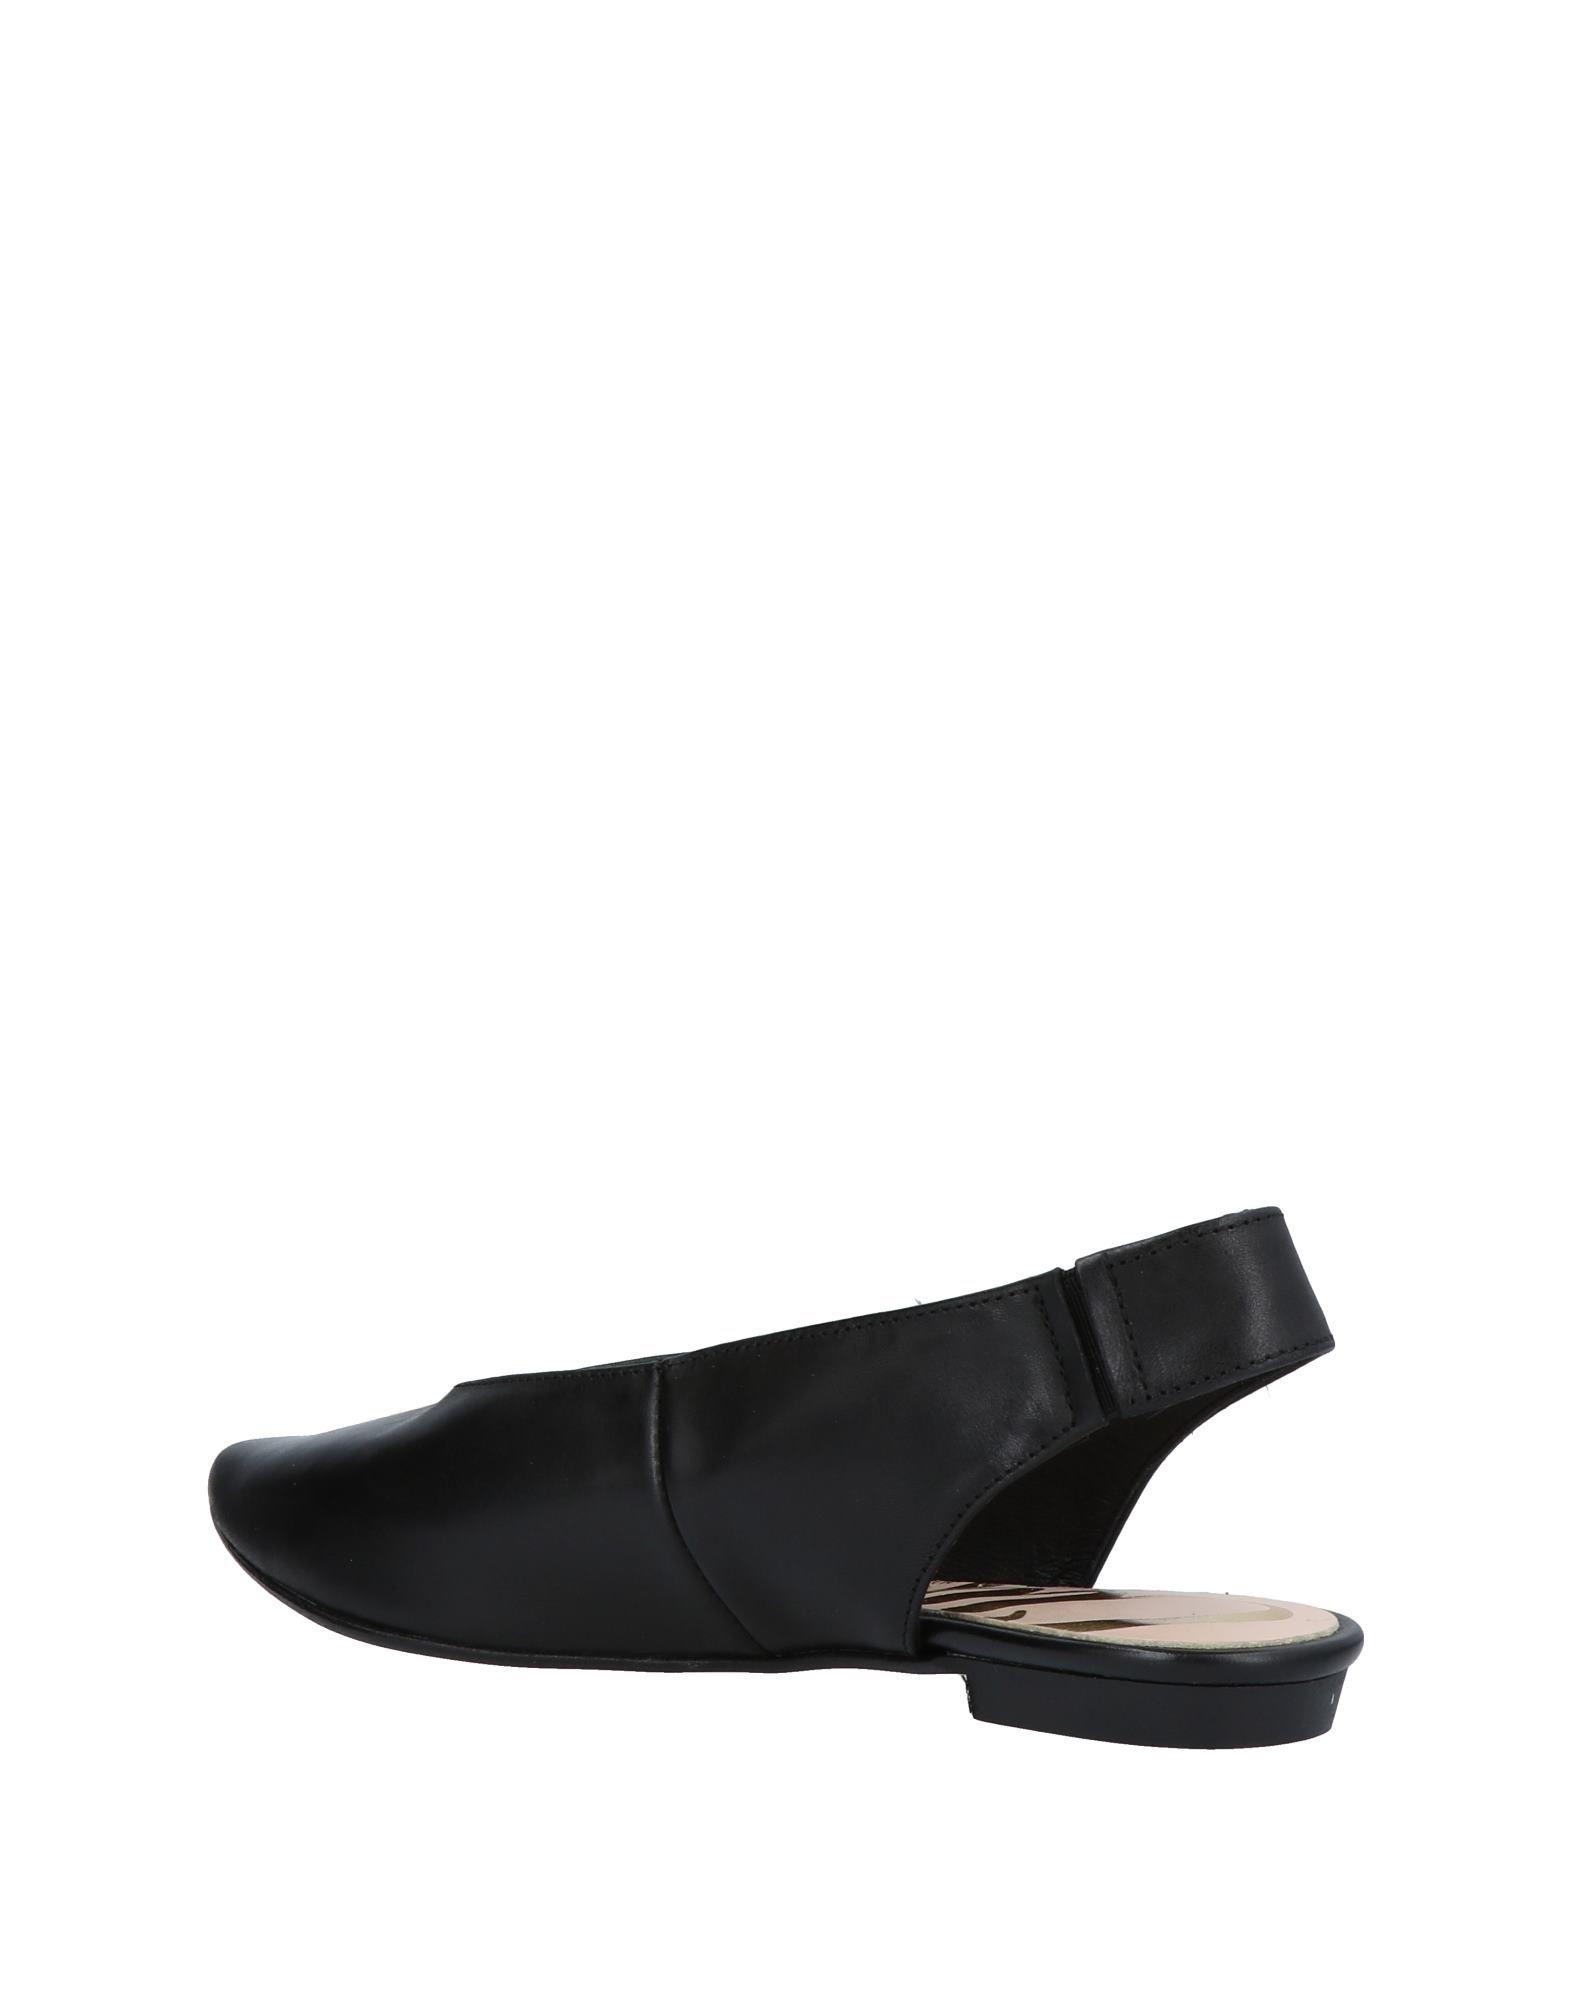 Cuplé Cuplé Cuplé Ballerinas Damen  11451194IP Gute Qualität beliebte Schuhe 2bbc9d